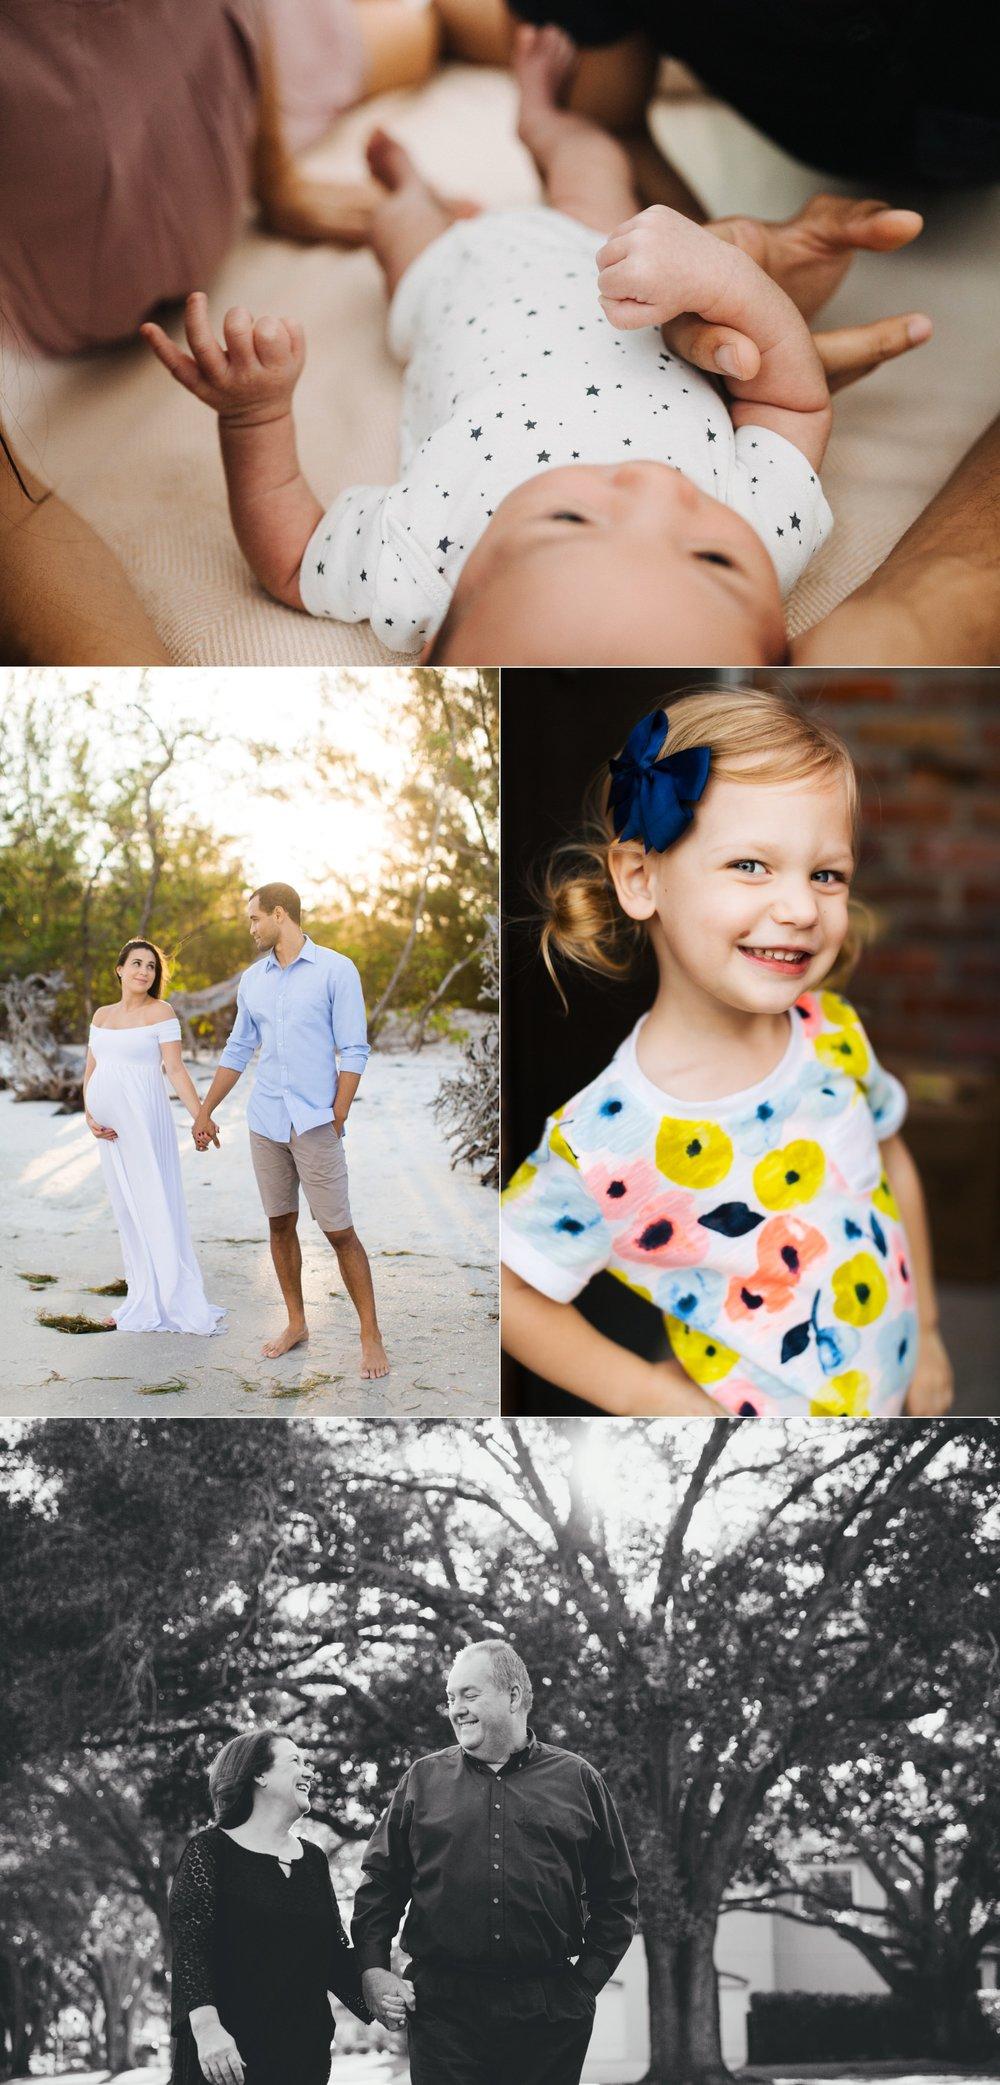 Jake & Katie's Best of Families 2016-034.jpg